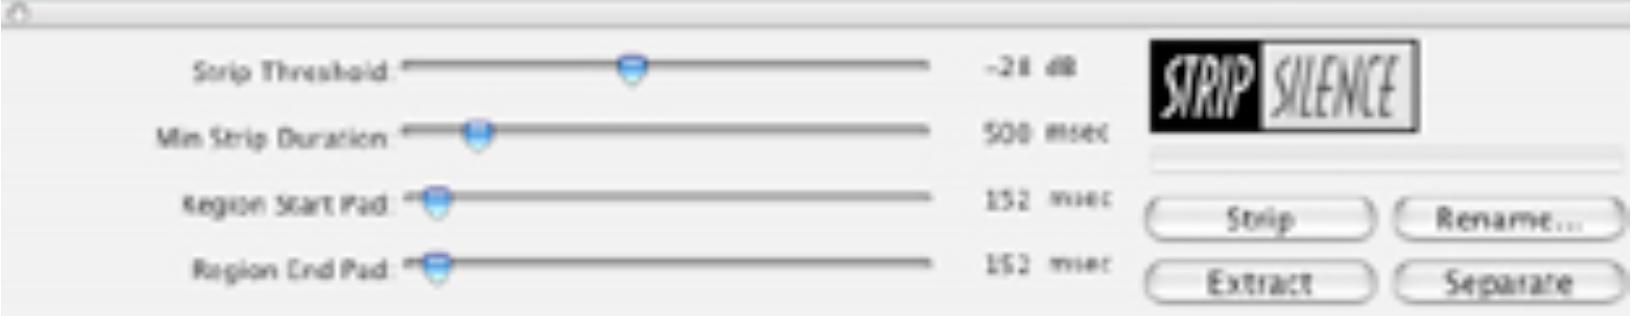 "Abbildung 16 - Screenshot mit Pro Tools-Dialog ""Strip silence"""